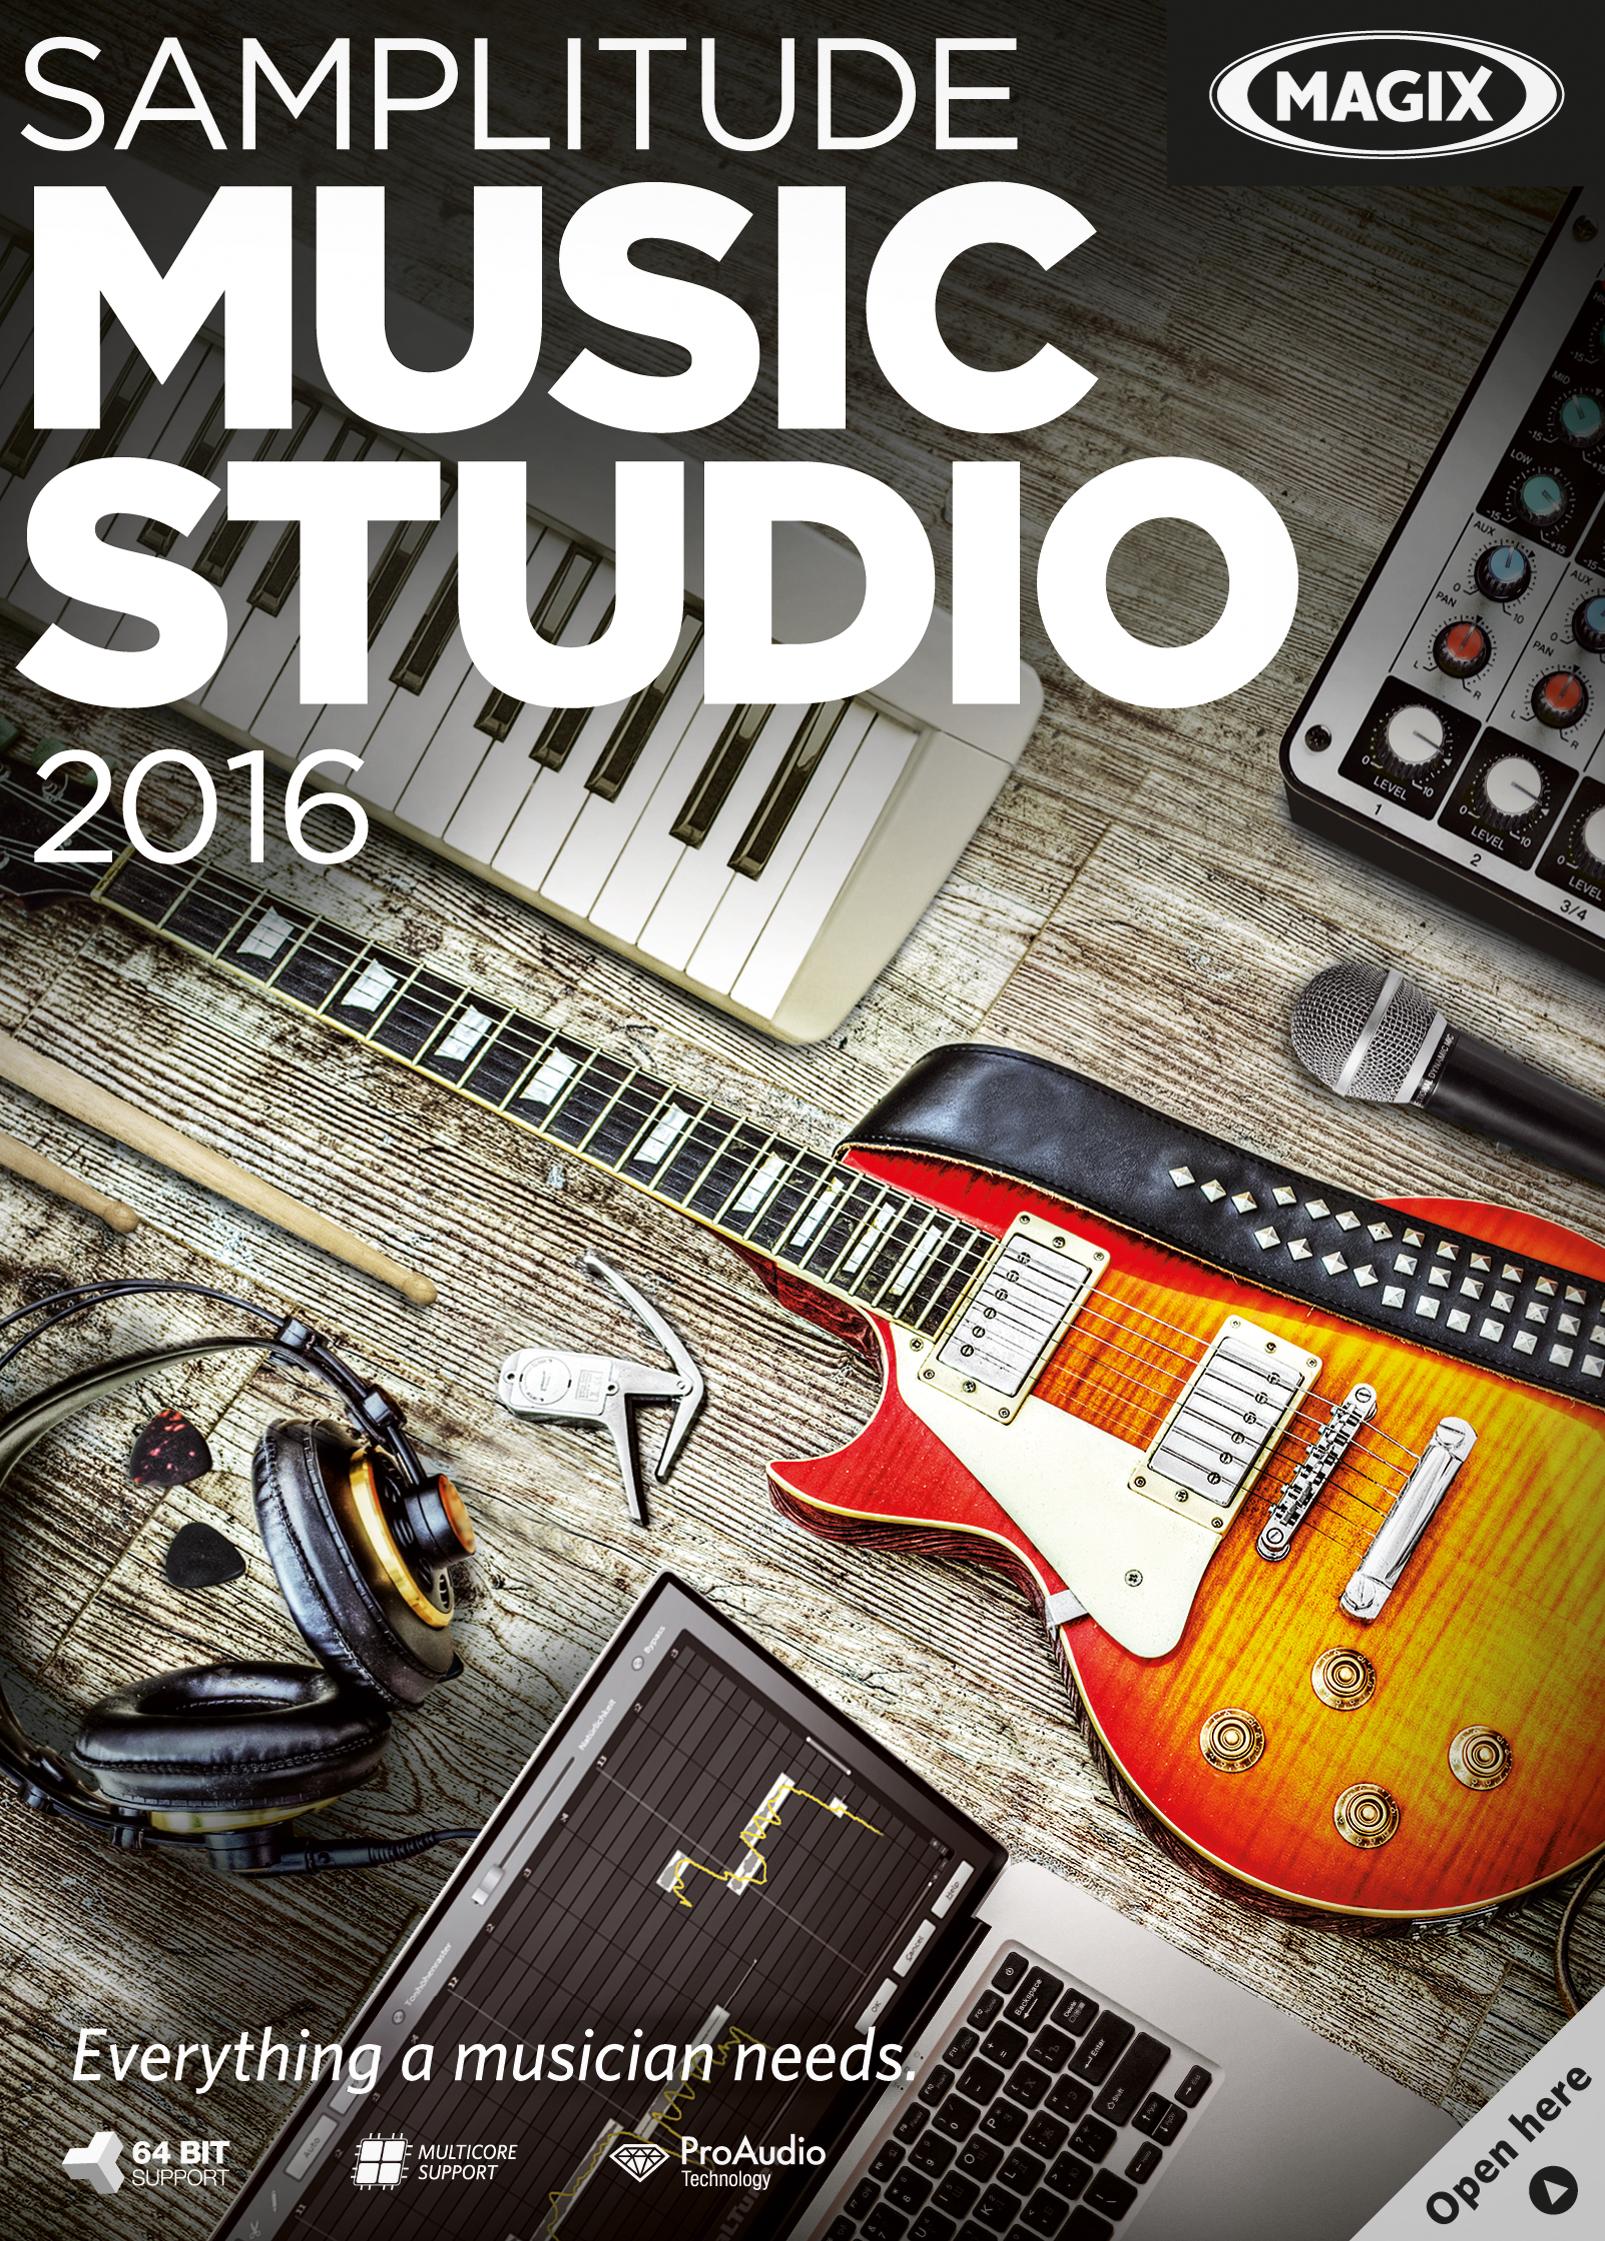 MAGIX Samplitude Music Studio 2016 [Download] by MAGIX